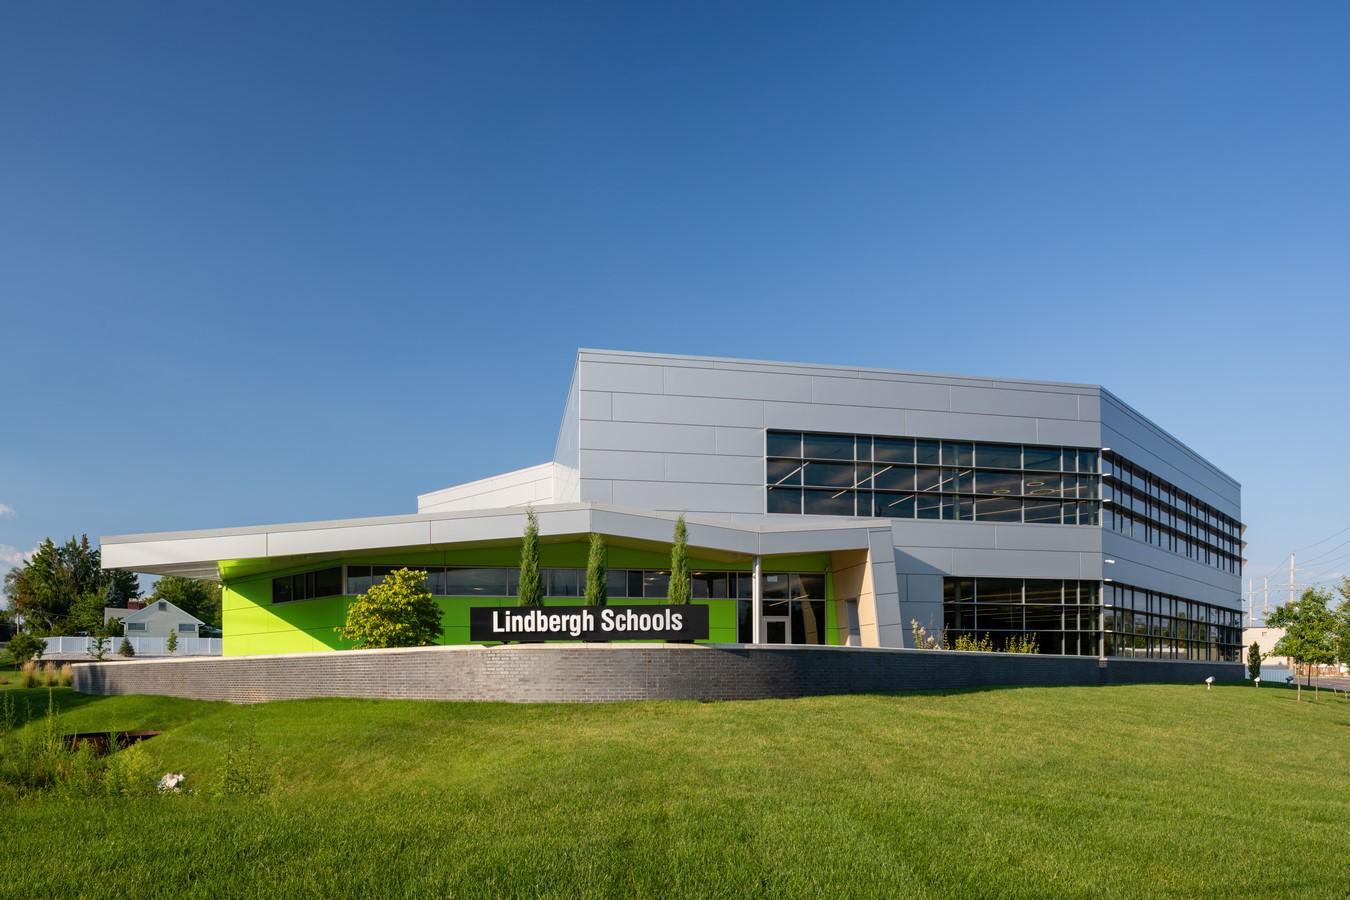 Lindbergh School Administration Center by Ittner Cordogan Clark - Sheet1